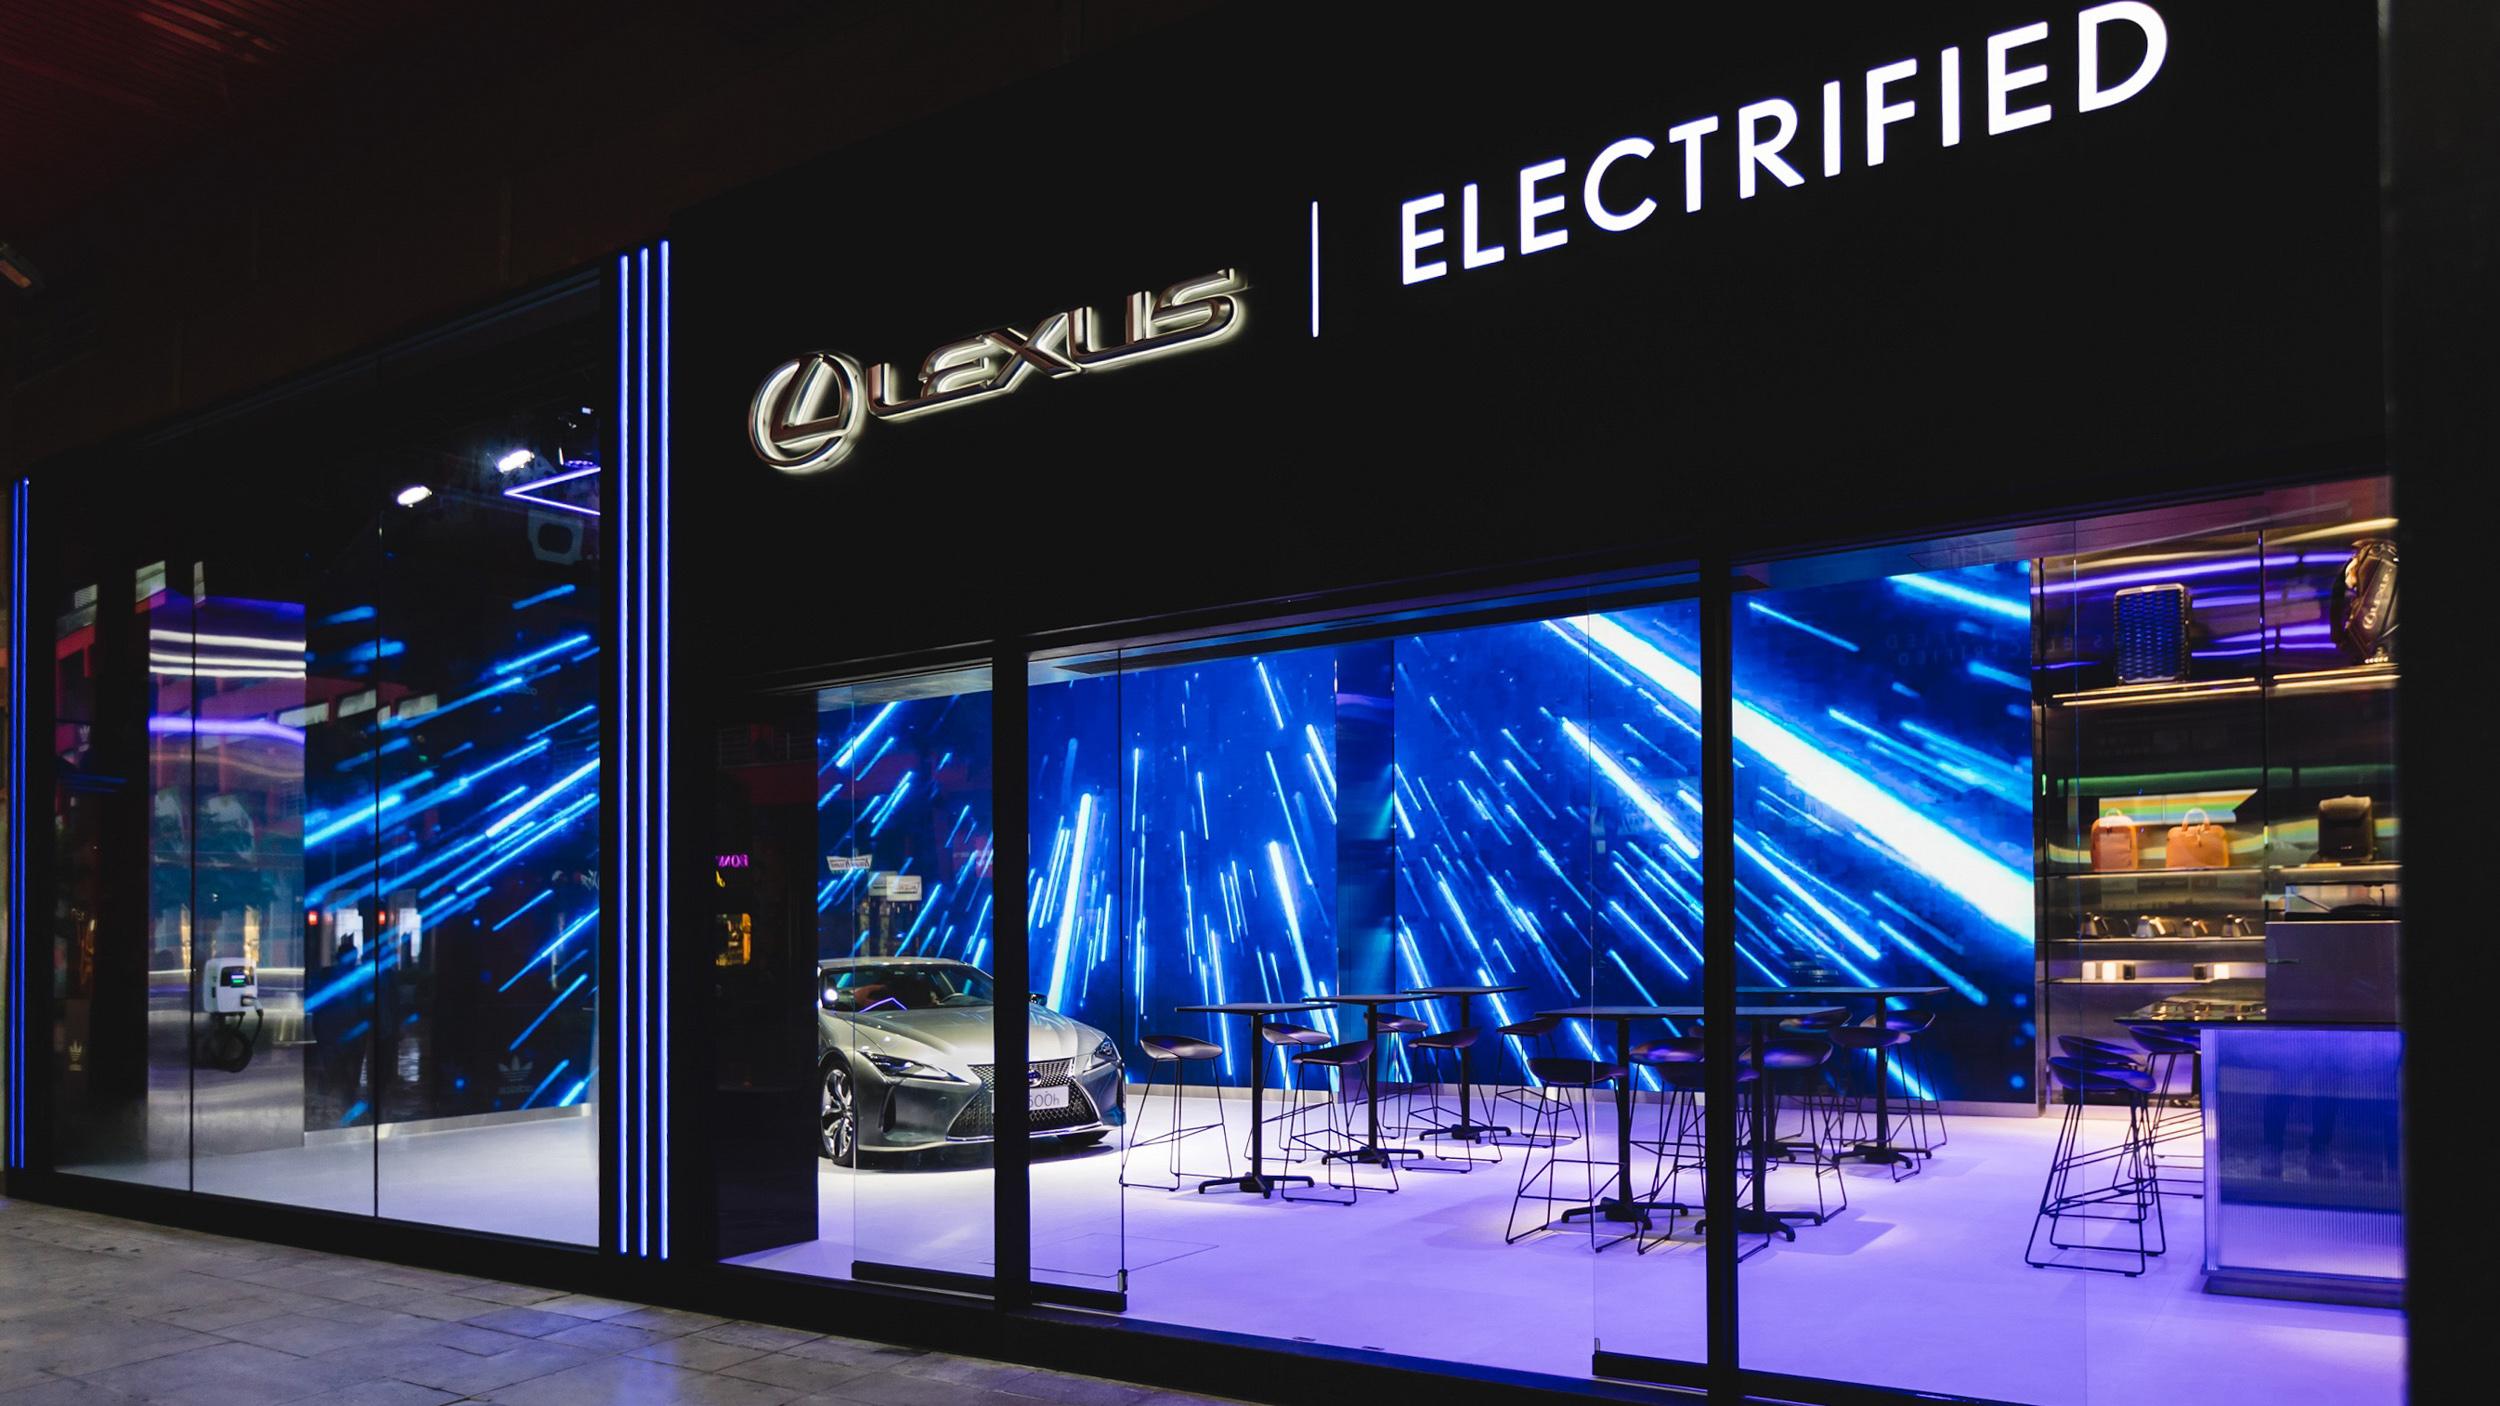 ▲ 「LEXUS ELECTRIFIED」品牌概念店進駐台北信義區